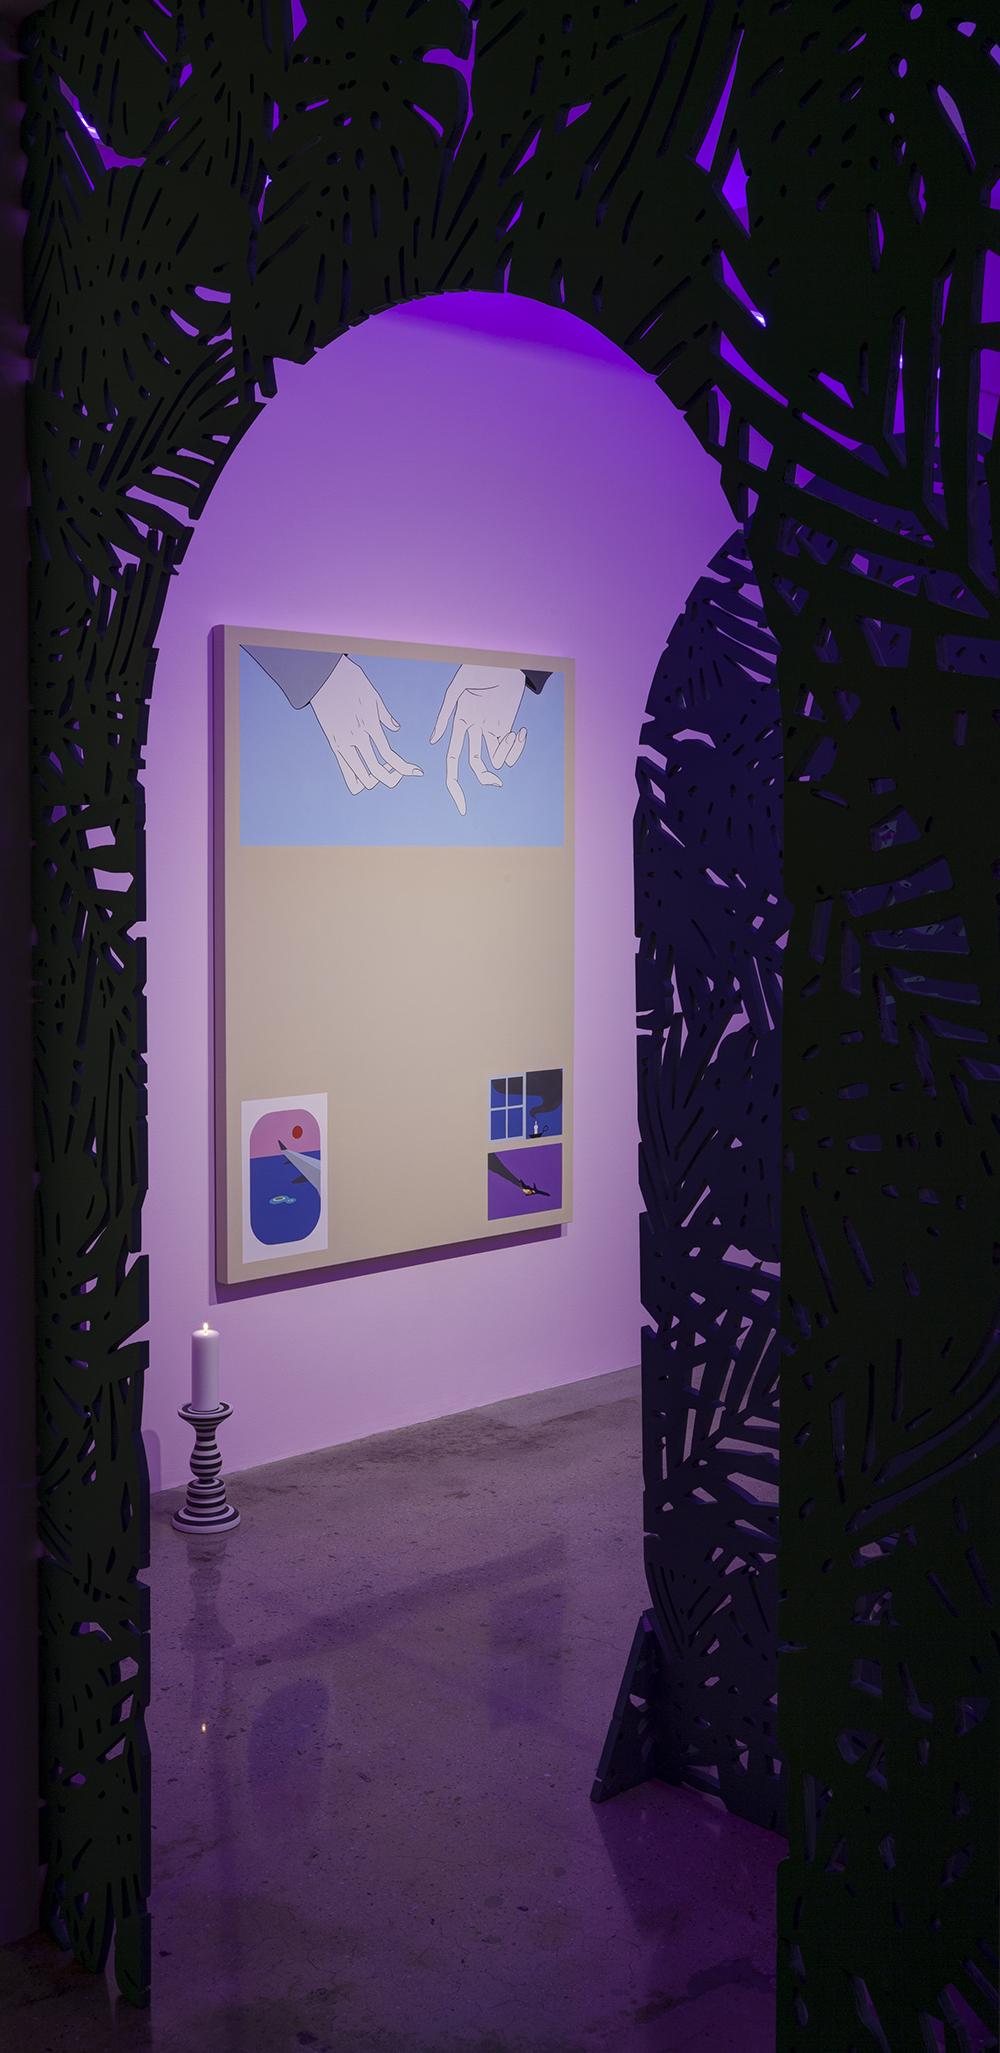 Greg Ito, Steve Turner, Los Angeles, Soothsayer